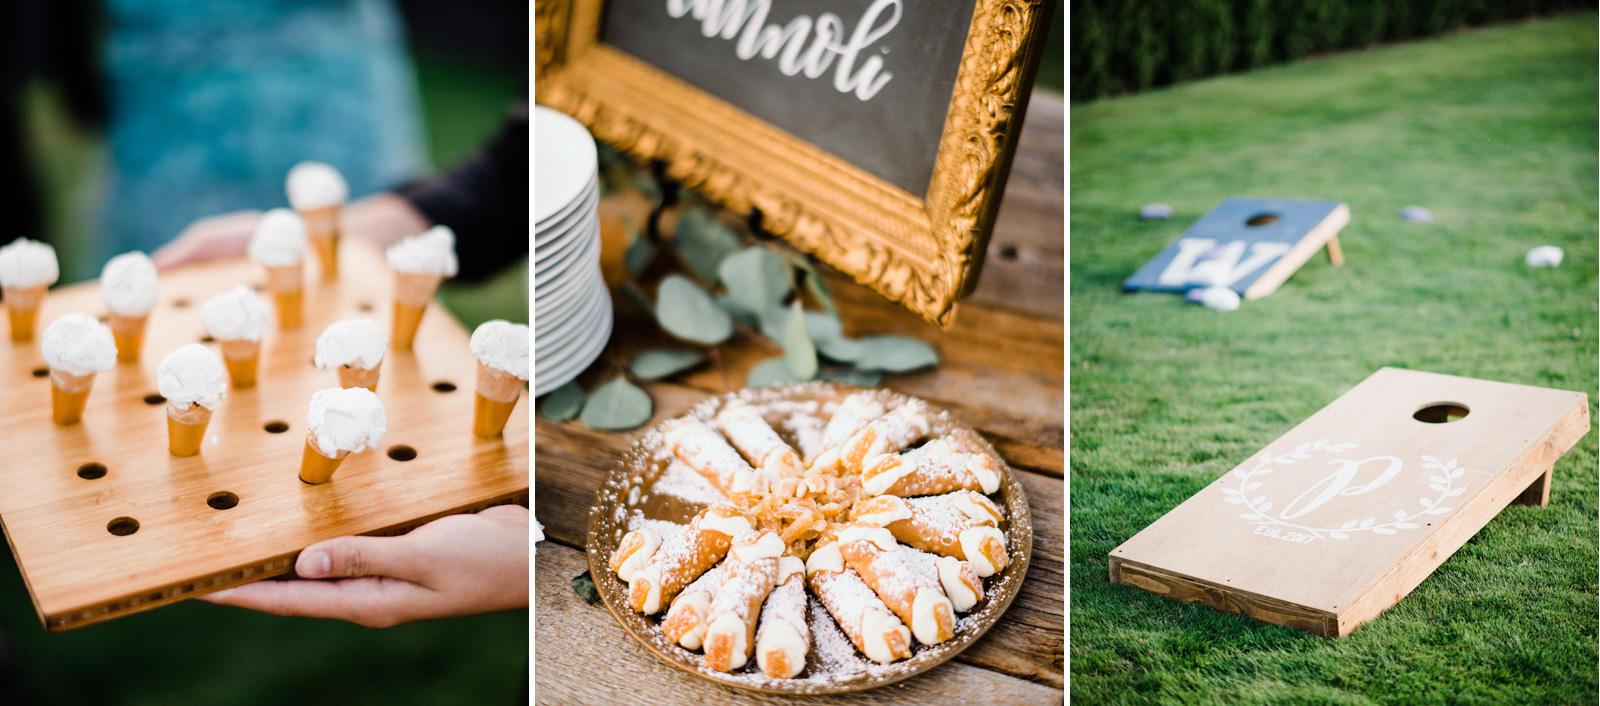 062-woodinville-lavendar-farm-wedding-with-golden-glowy-photos.jpg